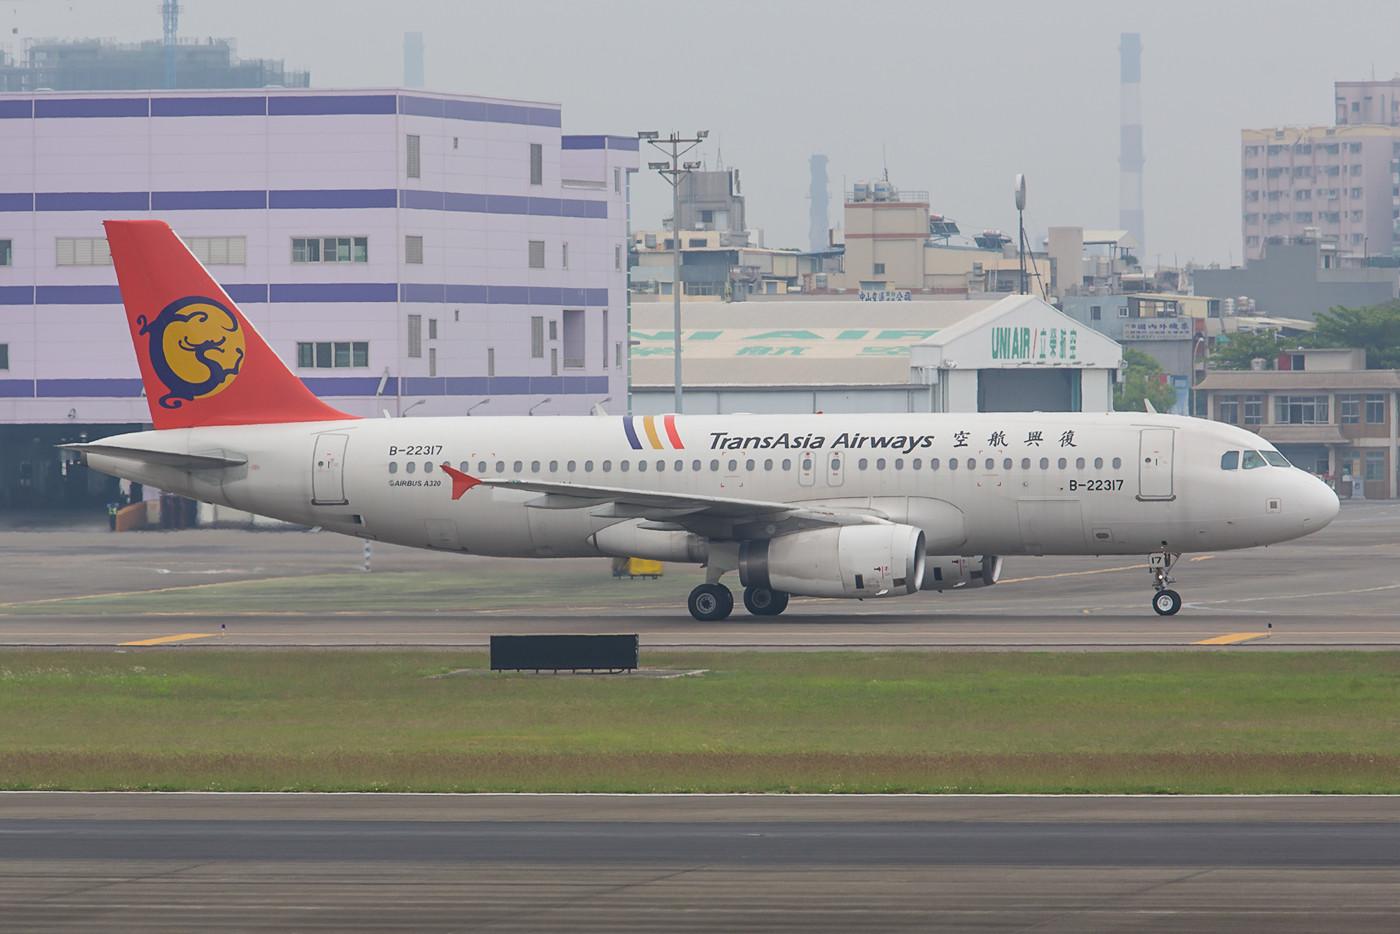 A 320 der Transasia Airlines.